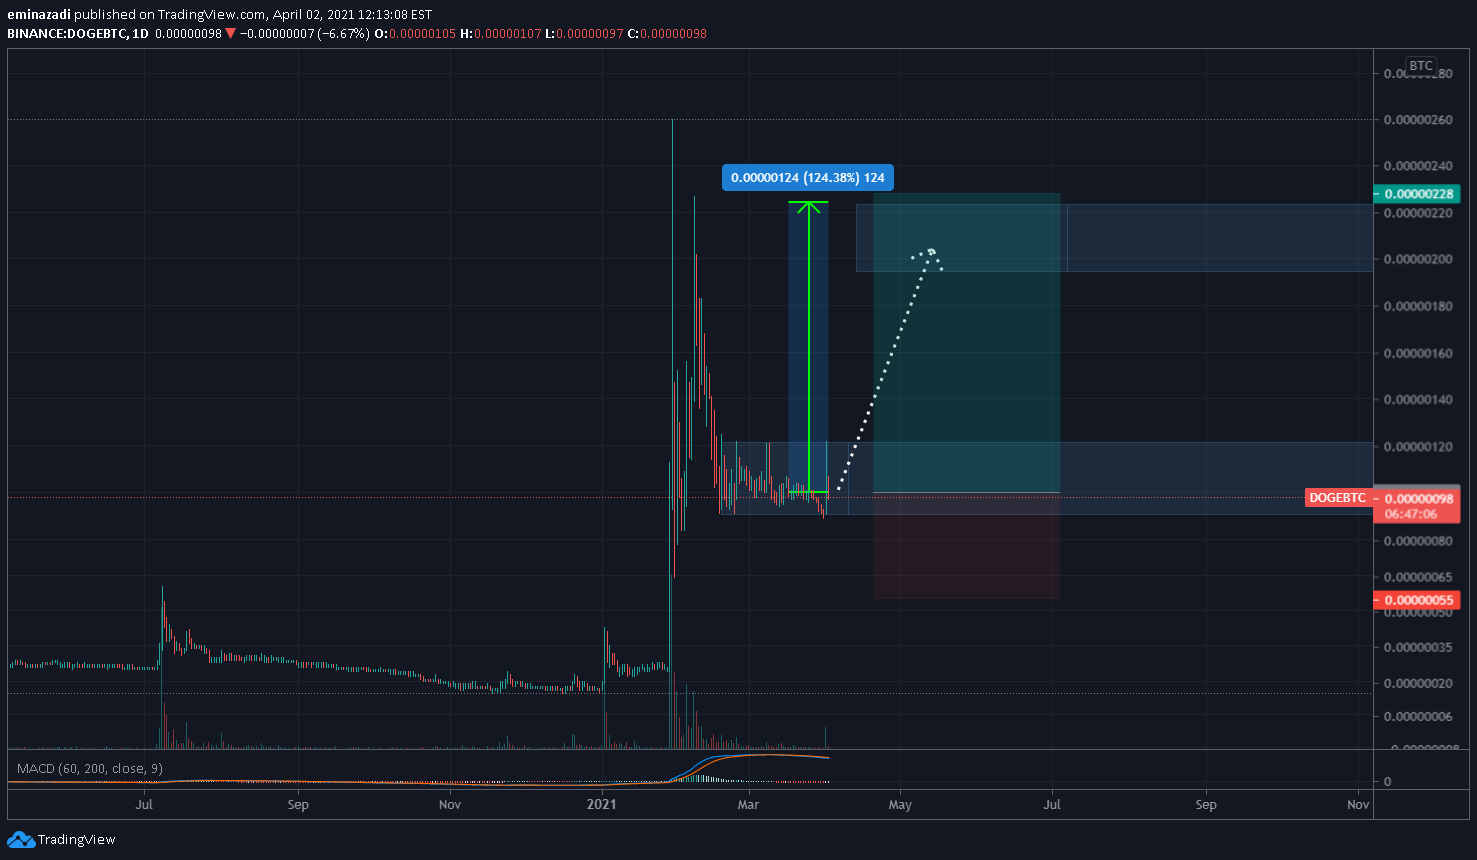 doge btc tradingview que bancos acepttan bitcoin